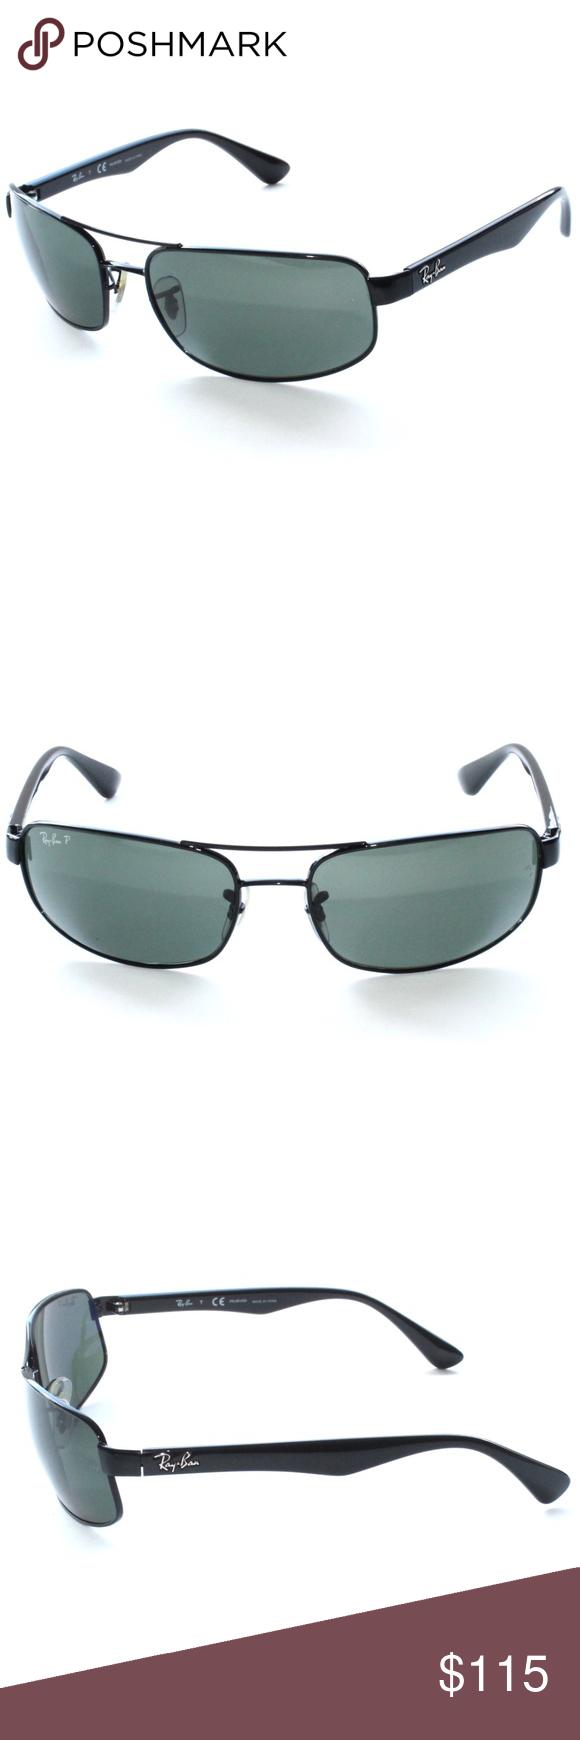 825fcc1e0f9 RAY-BAN Polarized Sunglasses RB 3445 002 58 61-17 RAY-BAN Polarized ...